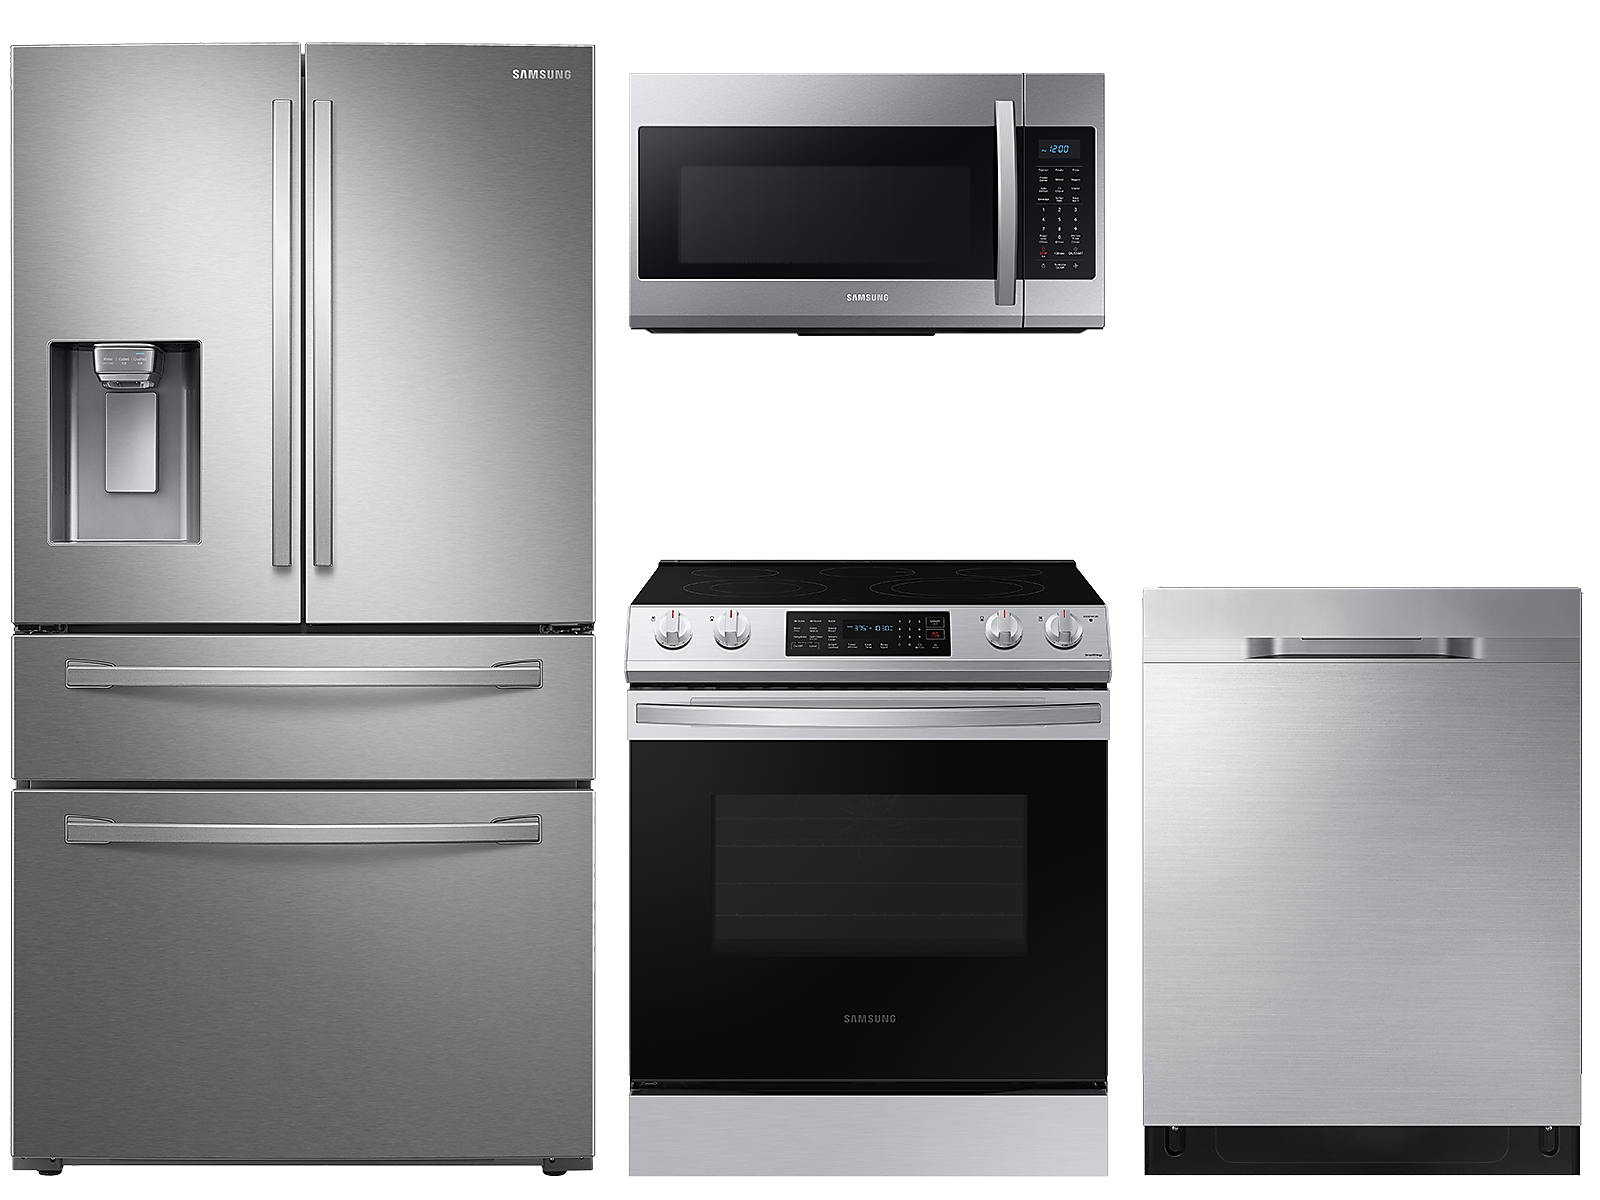 Samsung coupon: Samsung 23 cu. ft. counter depth 4-door refrigerator, 6.3 cu. ft. electric range, microwave and 48 dBA dishwasher package(BNDL-1614004843395)